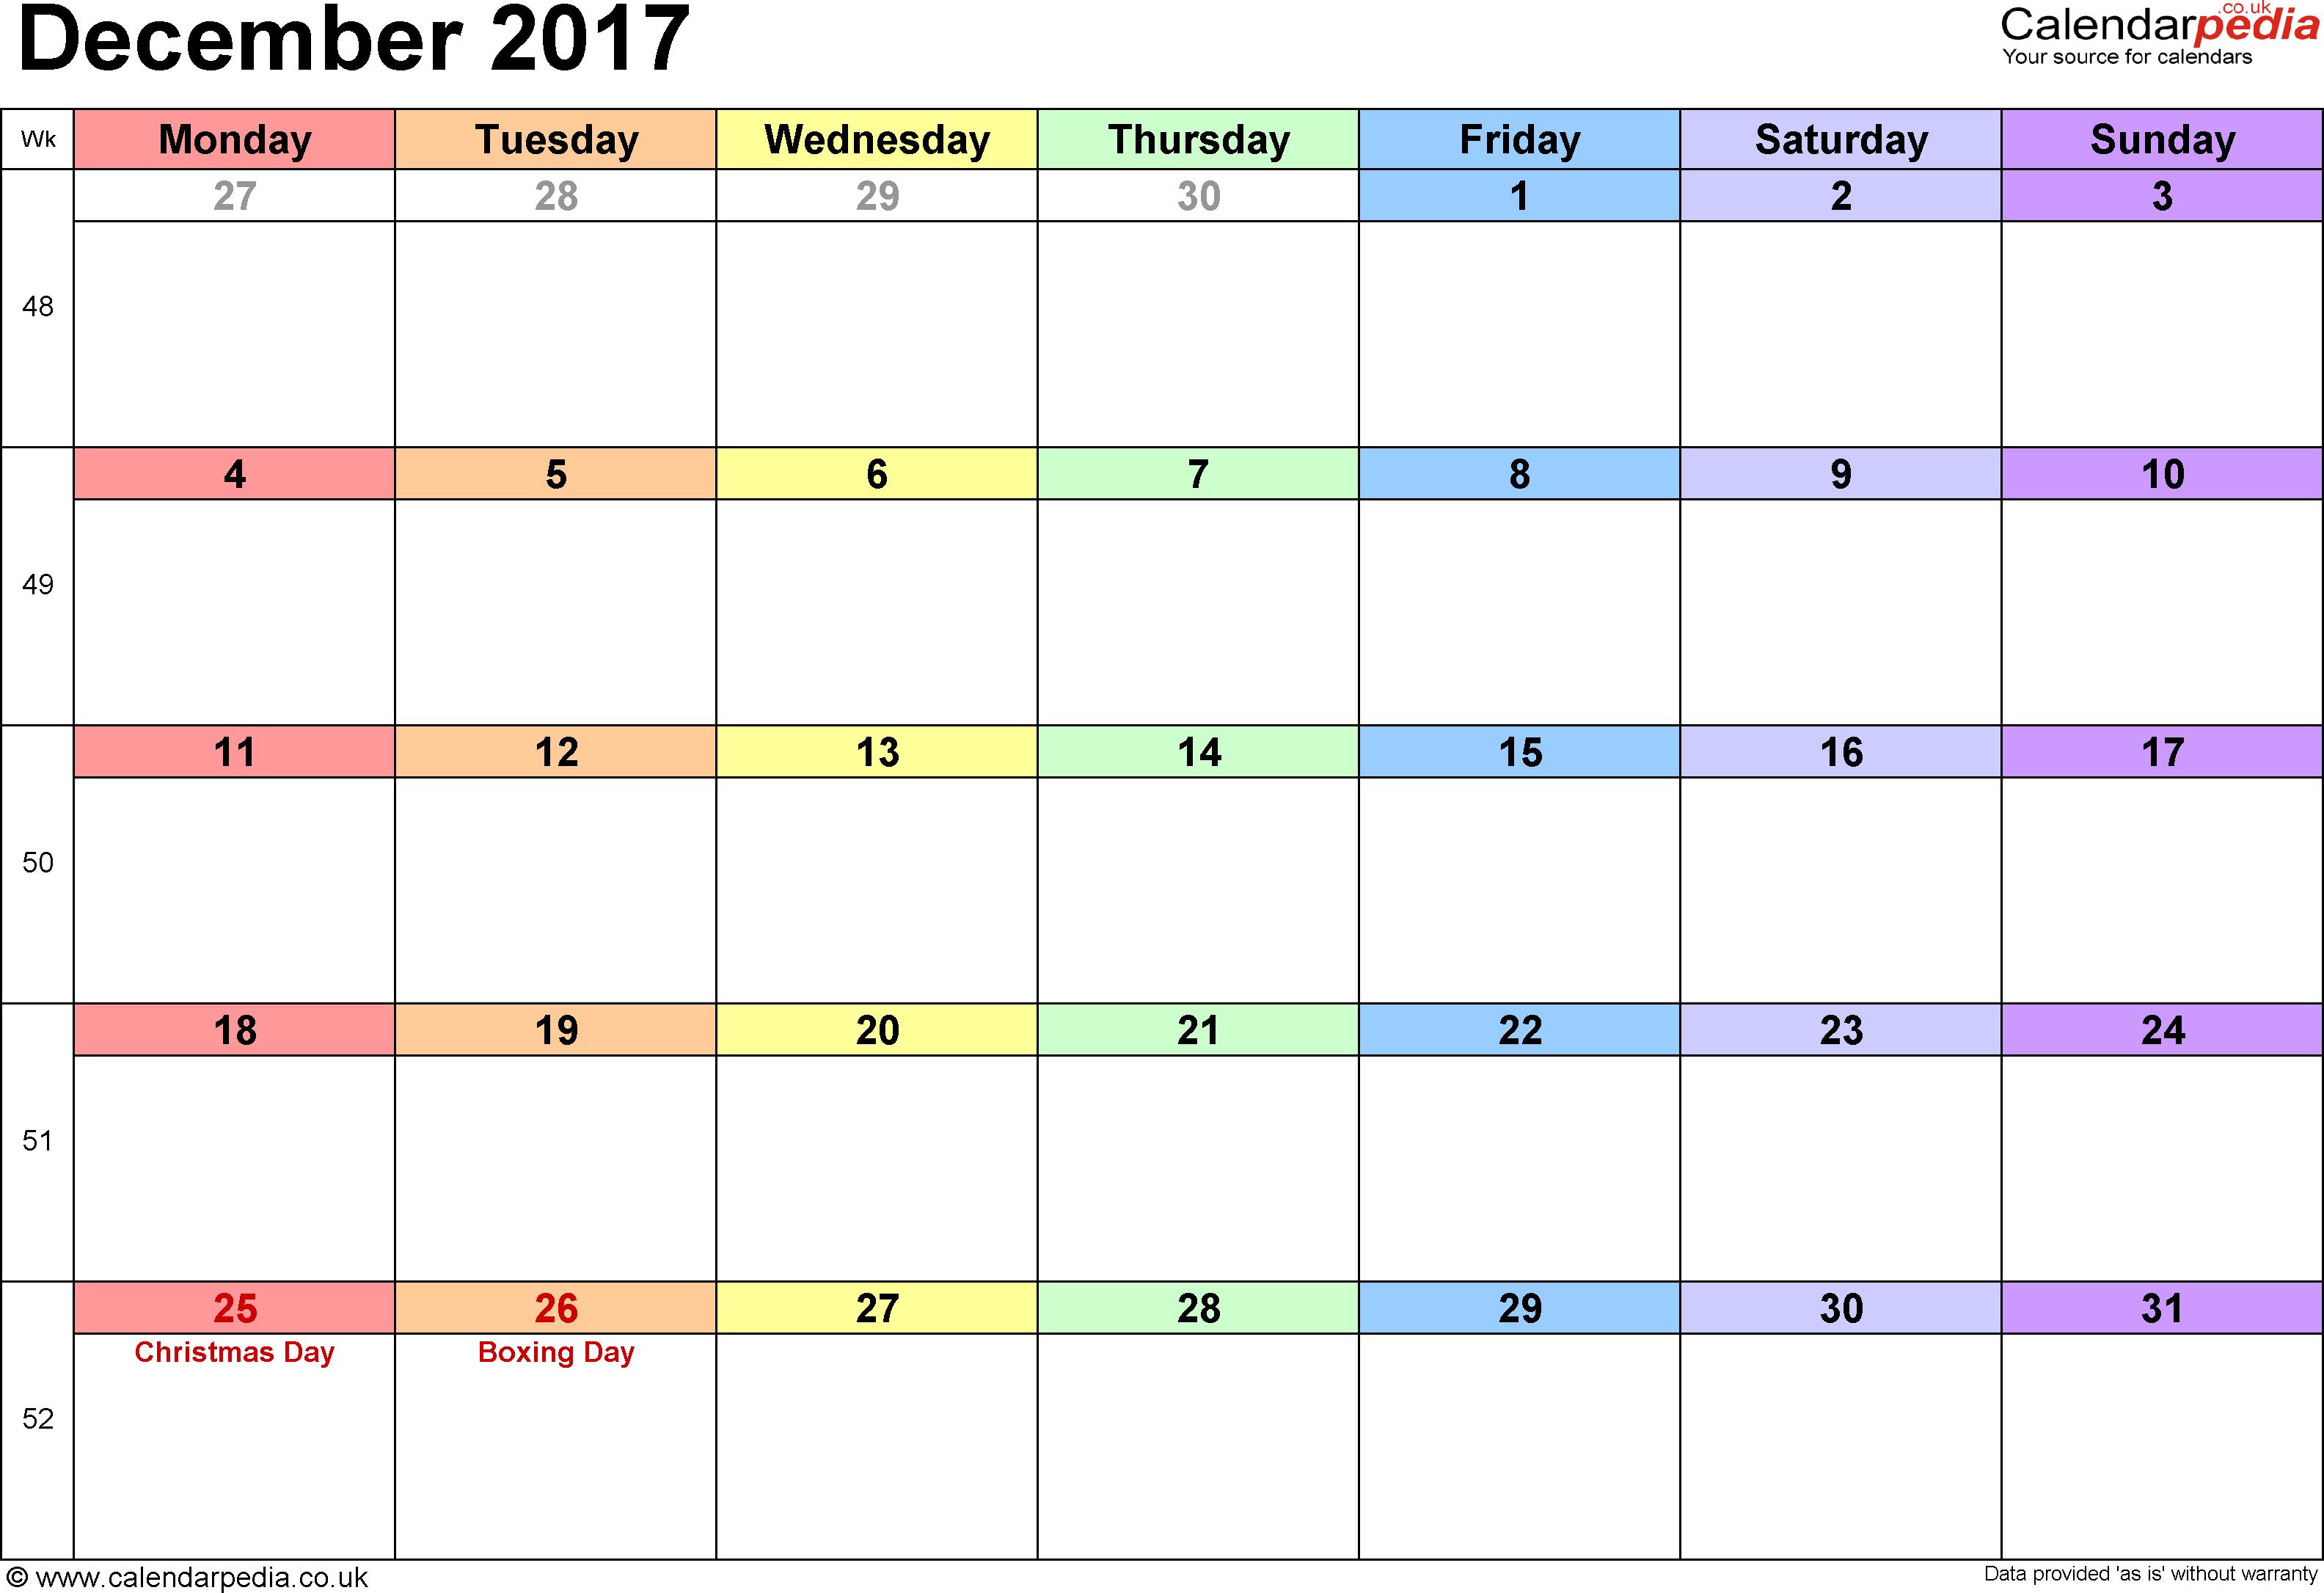 December 2017 Calendar Printable With Holidays | weekly calendar